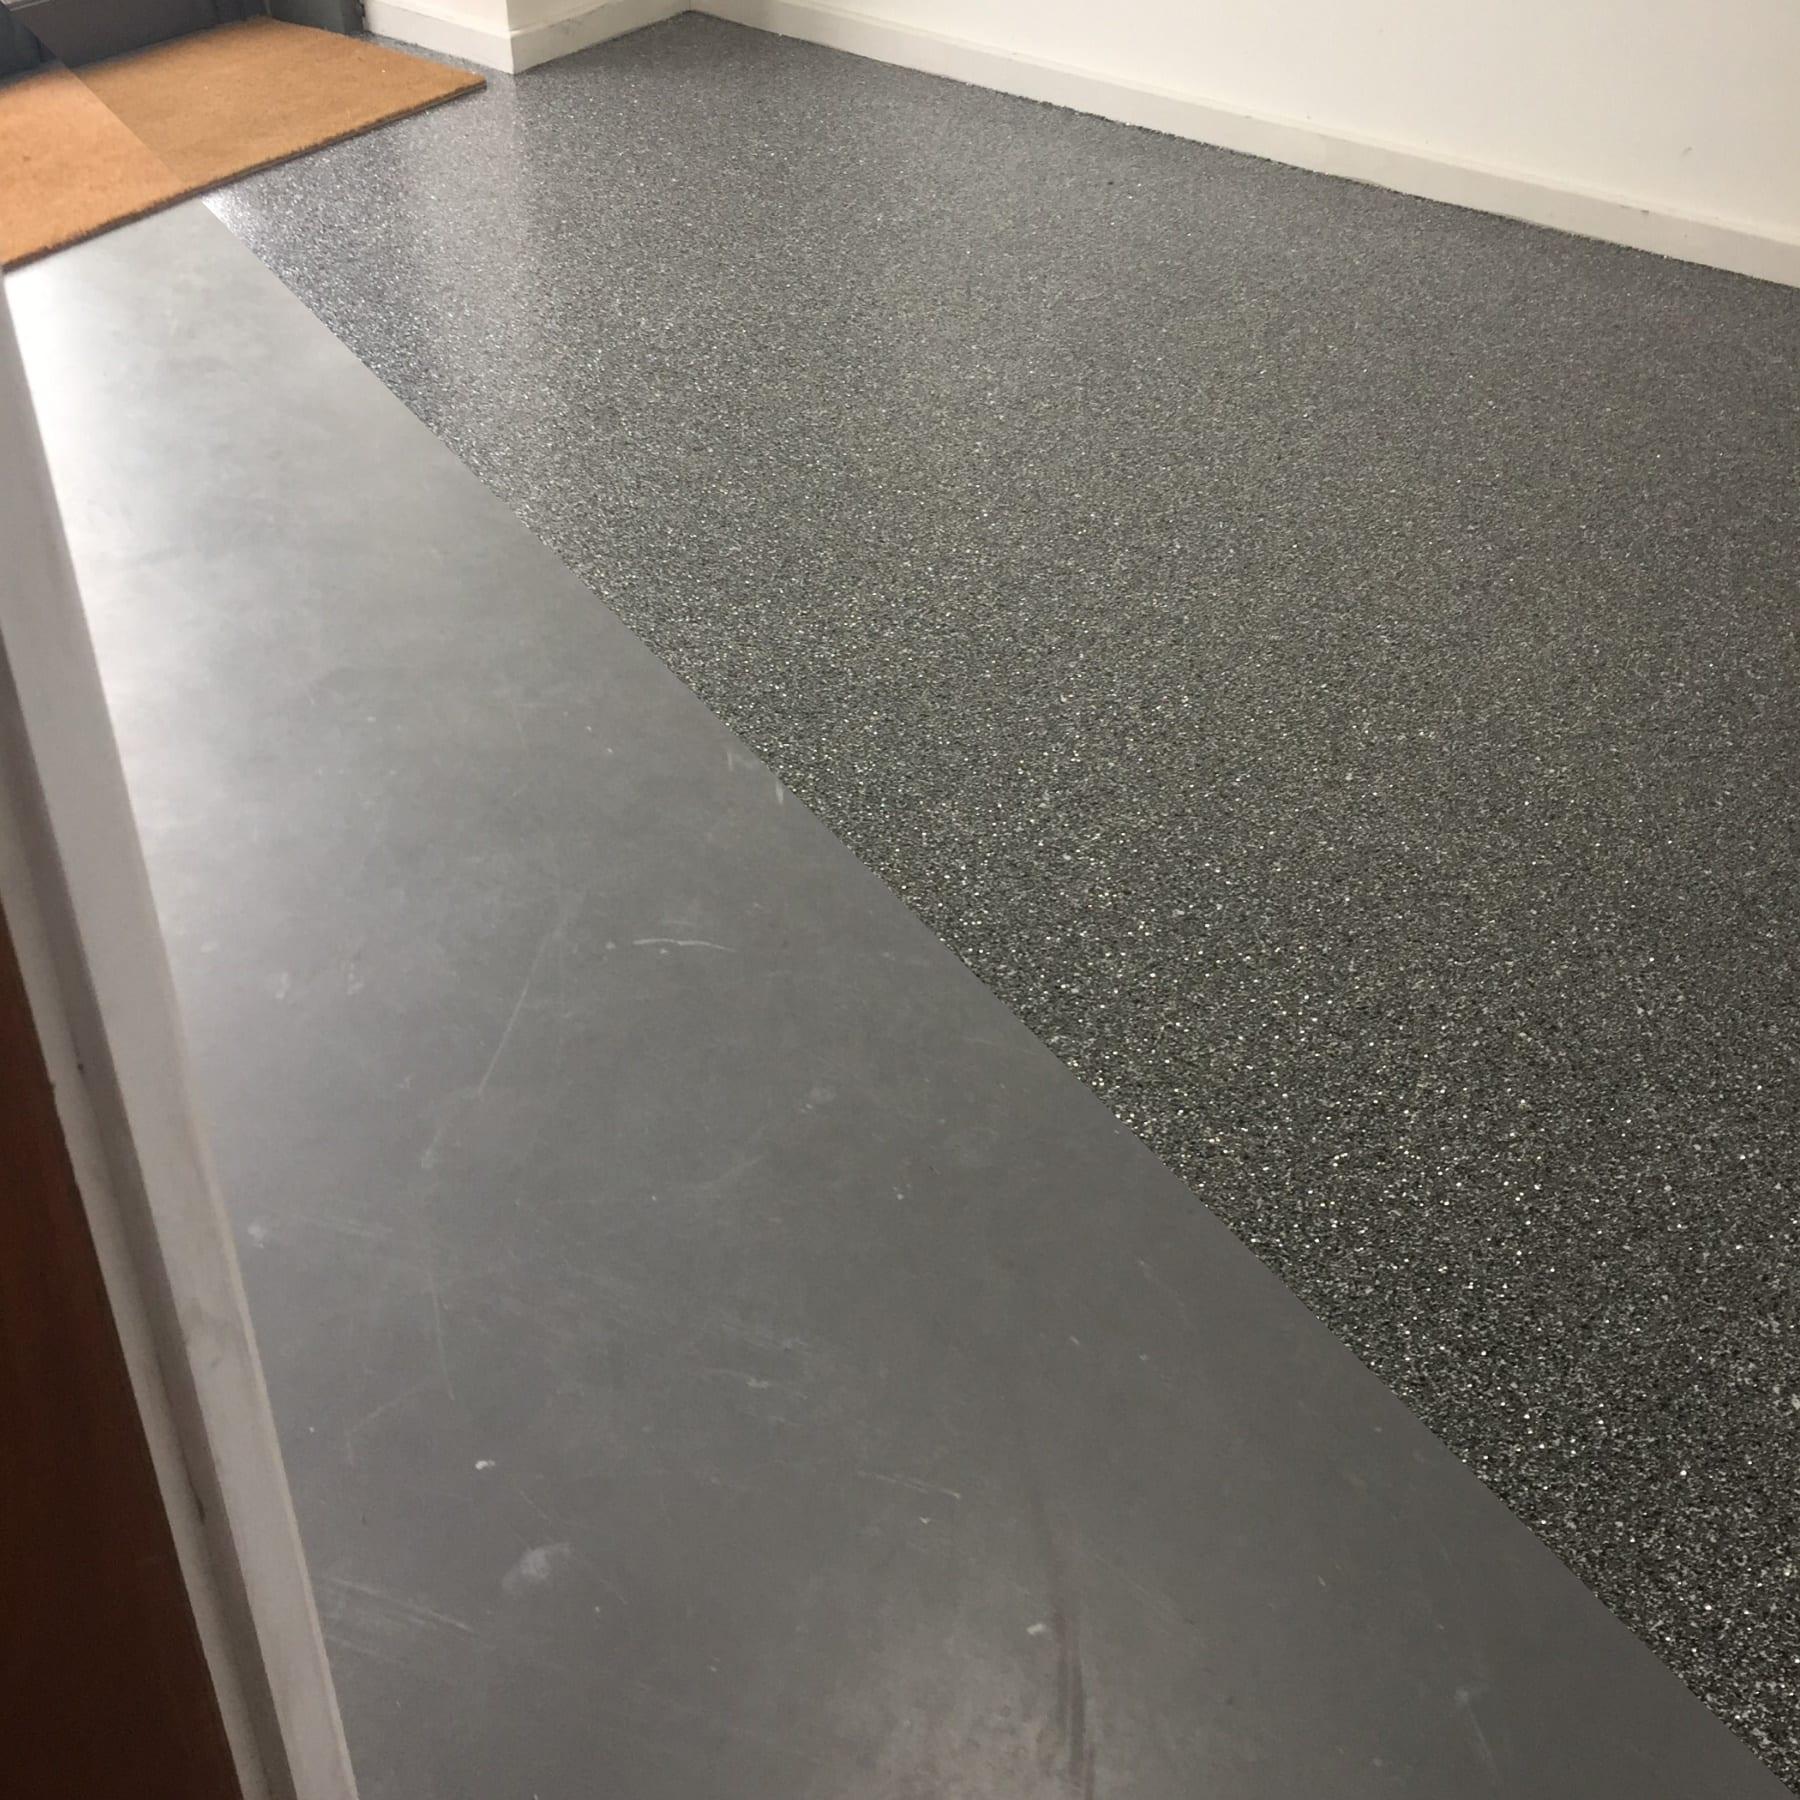 Monarflake - Decorative Resin Flooring